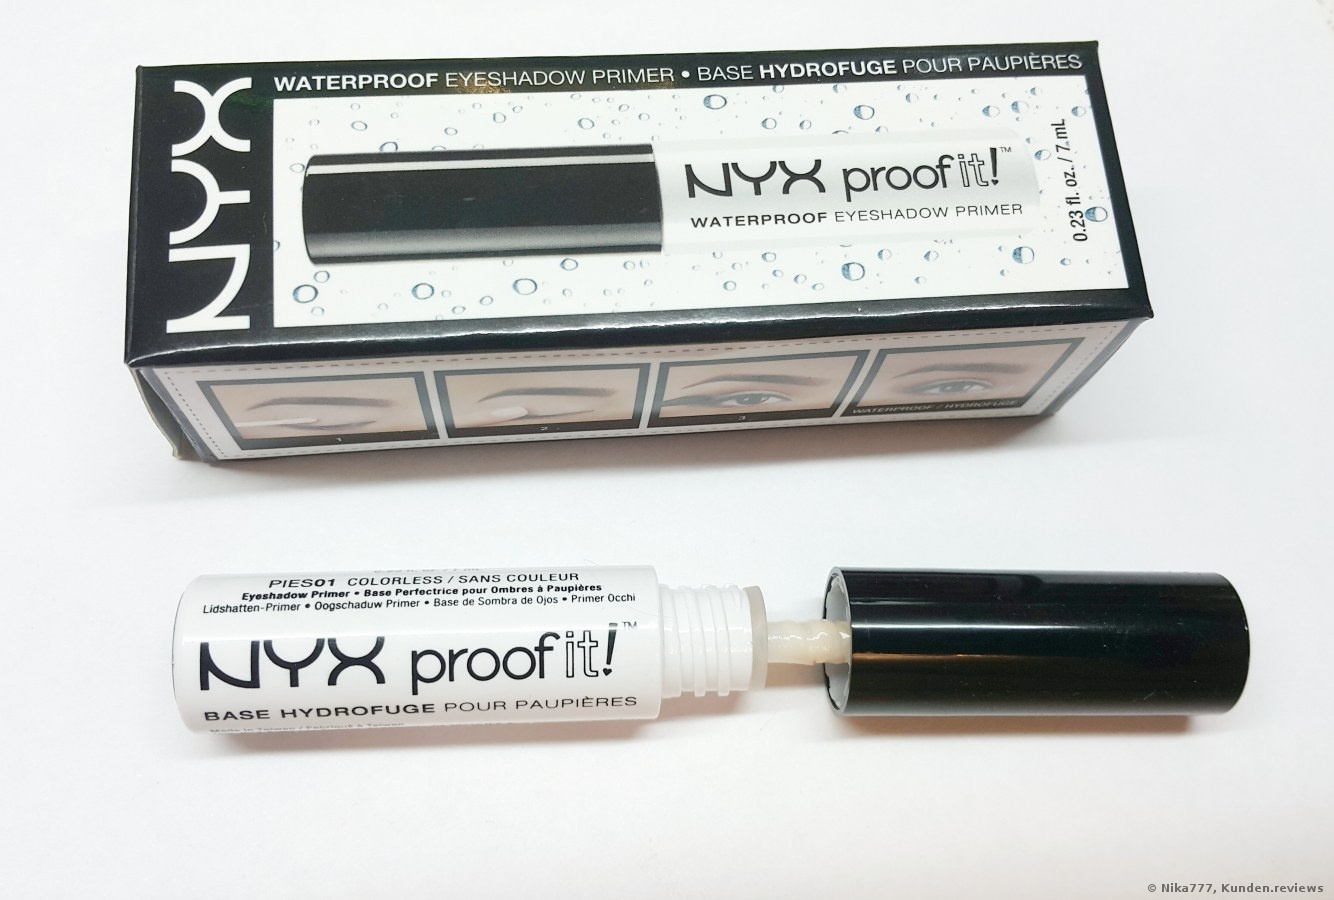 NYX PROOF IT! WATERPROOF EYE SHADOW PRIMER  Foto